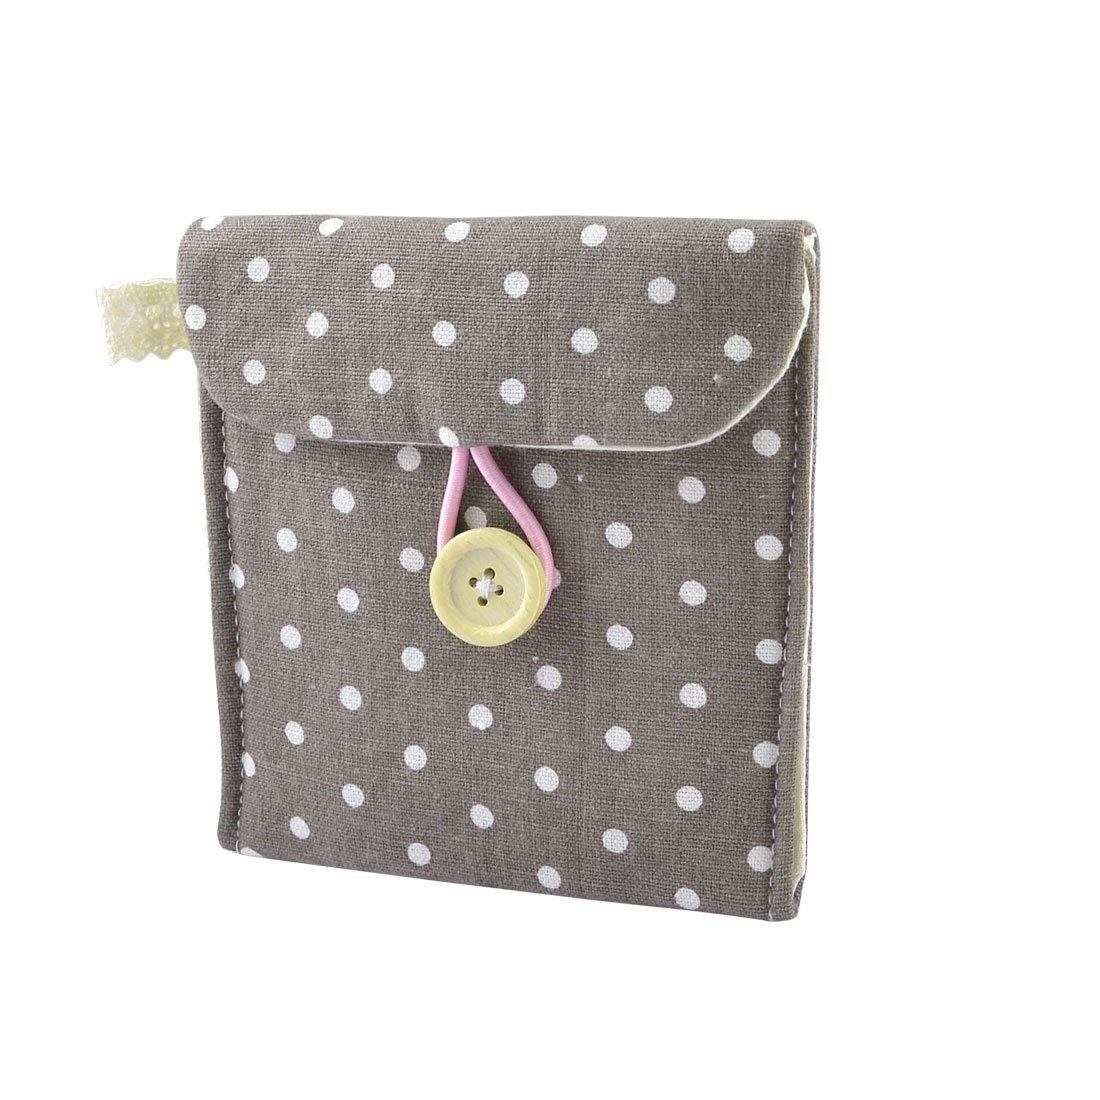 FSLH-New Girl Cotton Blends Polka Dots Sanitary Pad Holder Button Bag Case(China (Mainland))